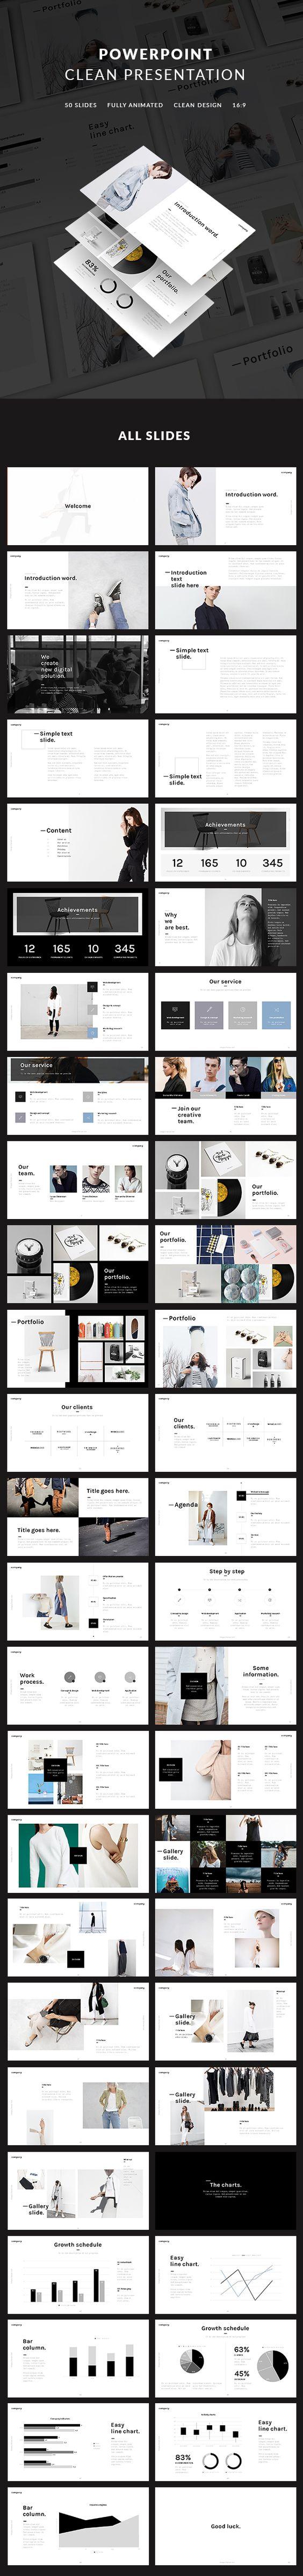 Clean Presentation (PowerPoint Templates)